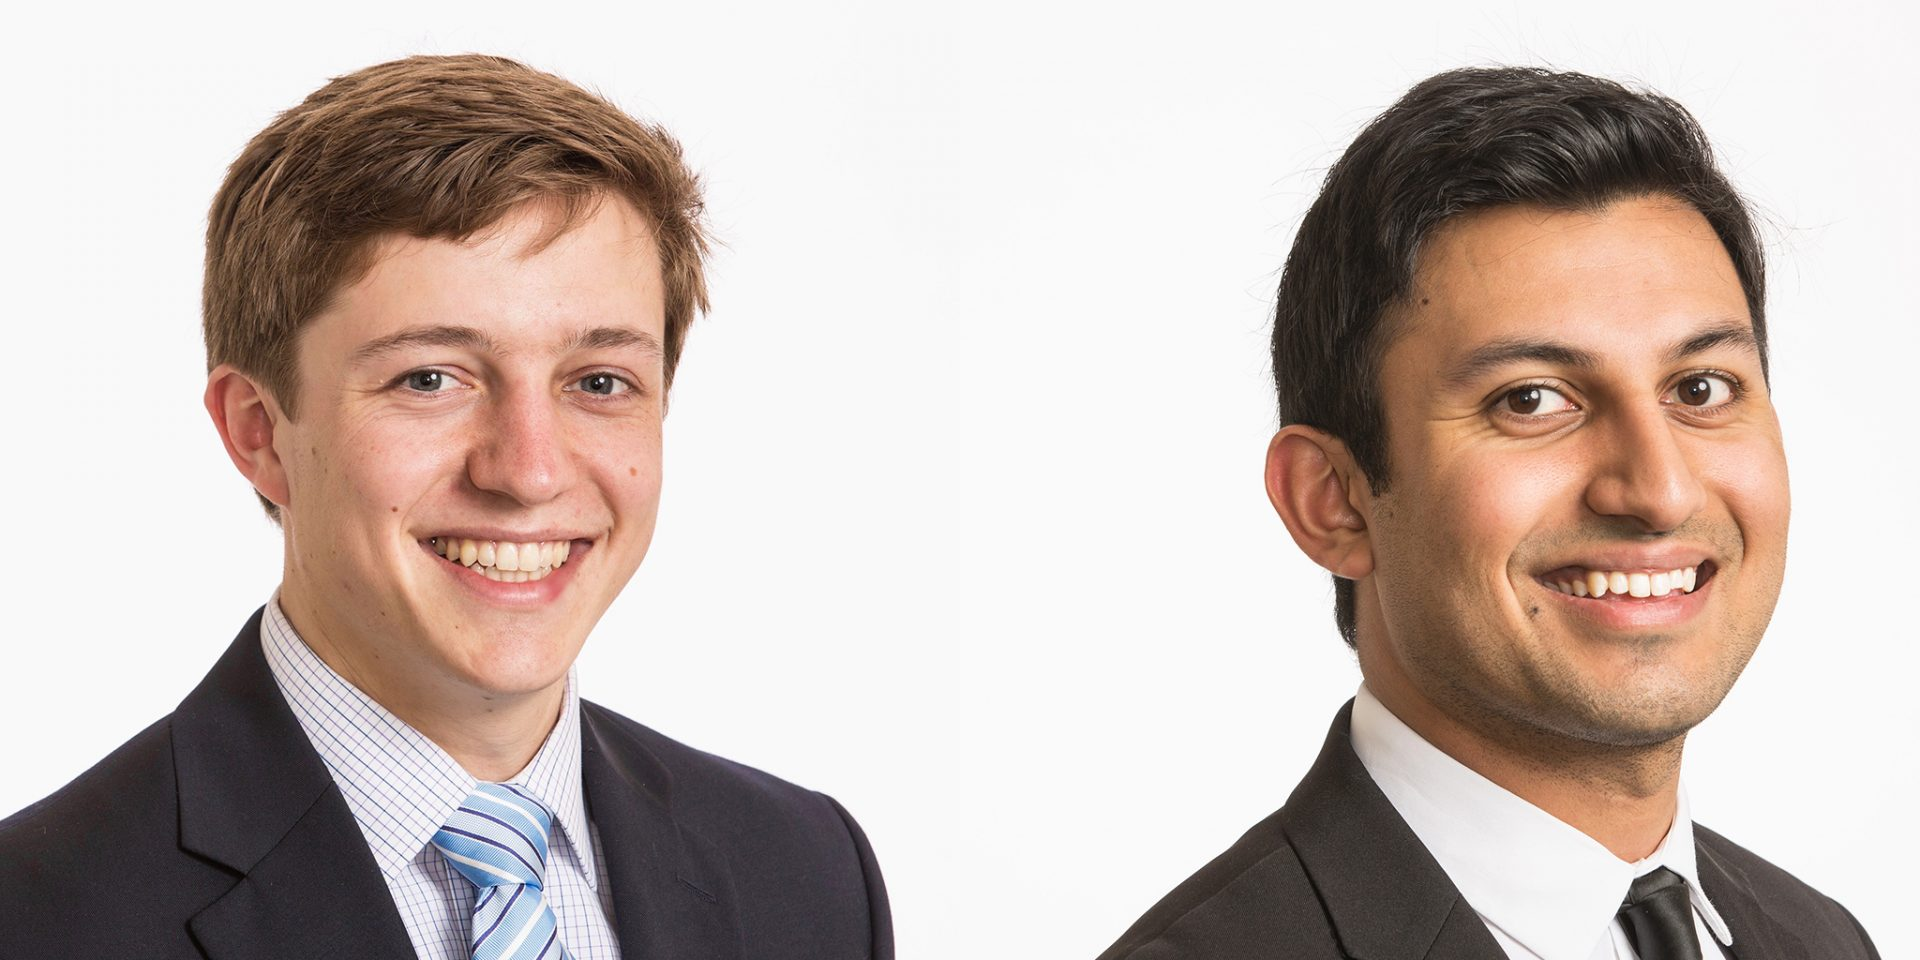 Cameron Champion '20 and Mihir Shah '20